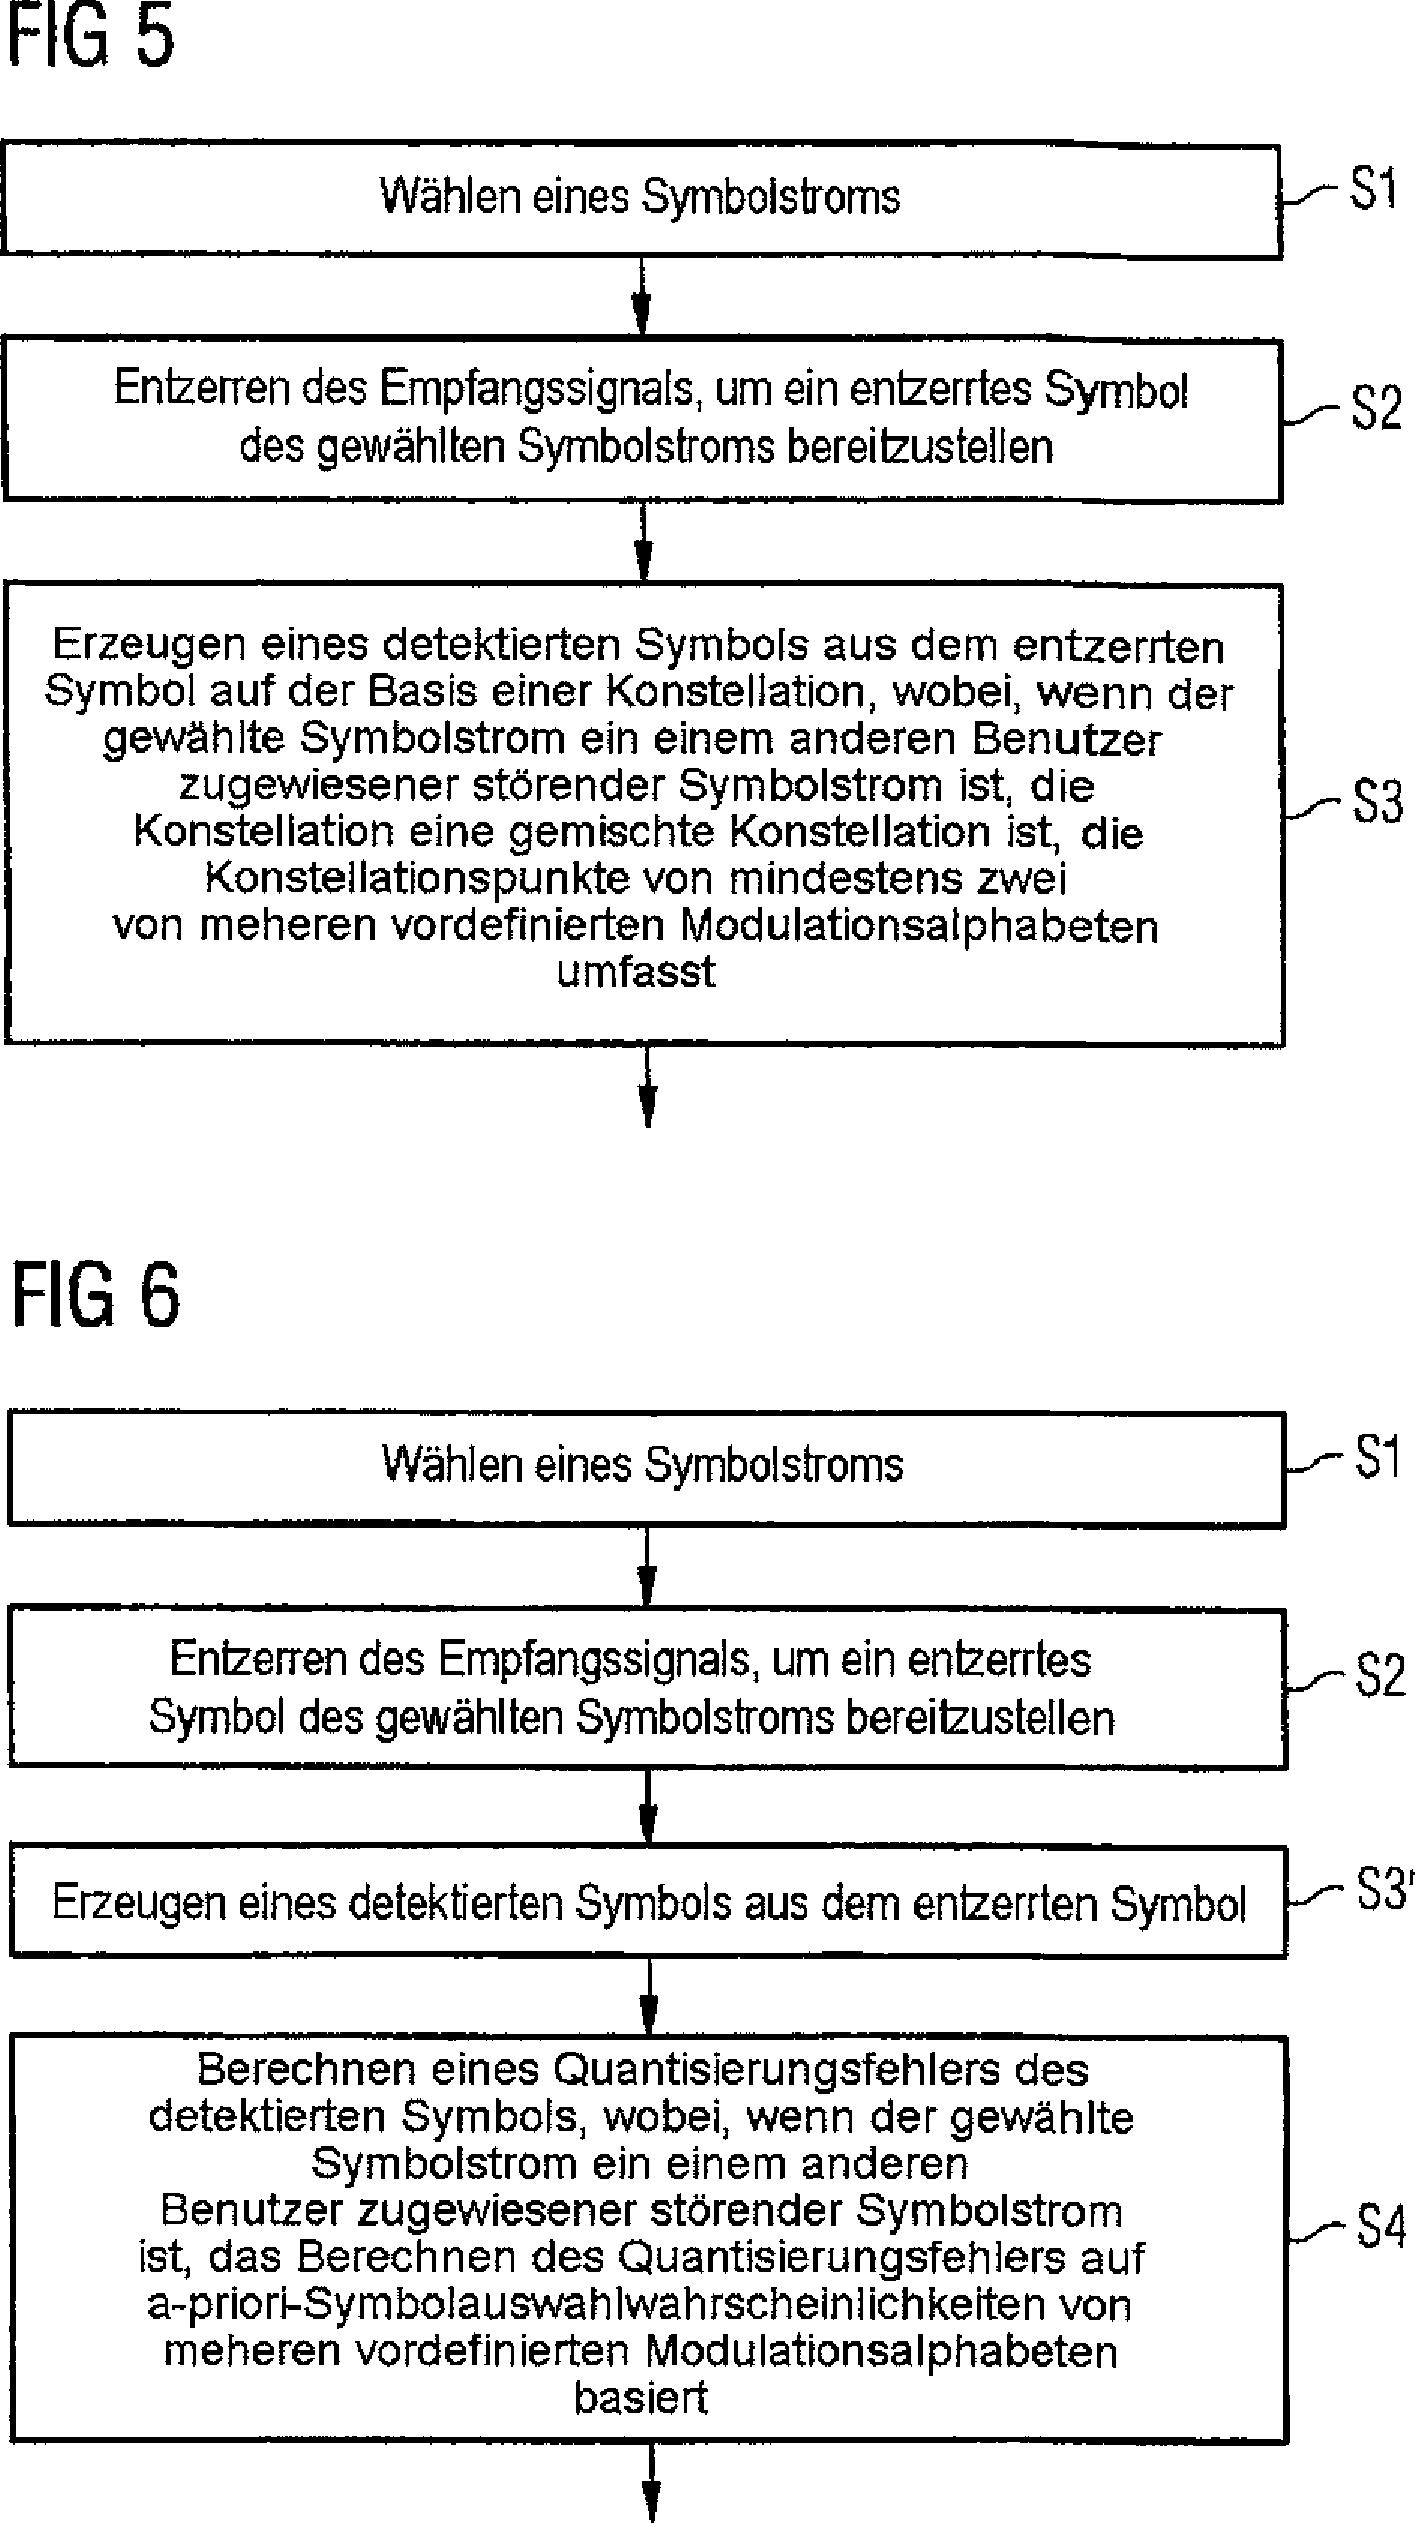 Fantastisch Schaltpläne Symbole Galerie - Verdrahtungsideen - korsmi ...